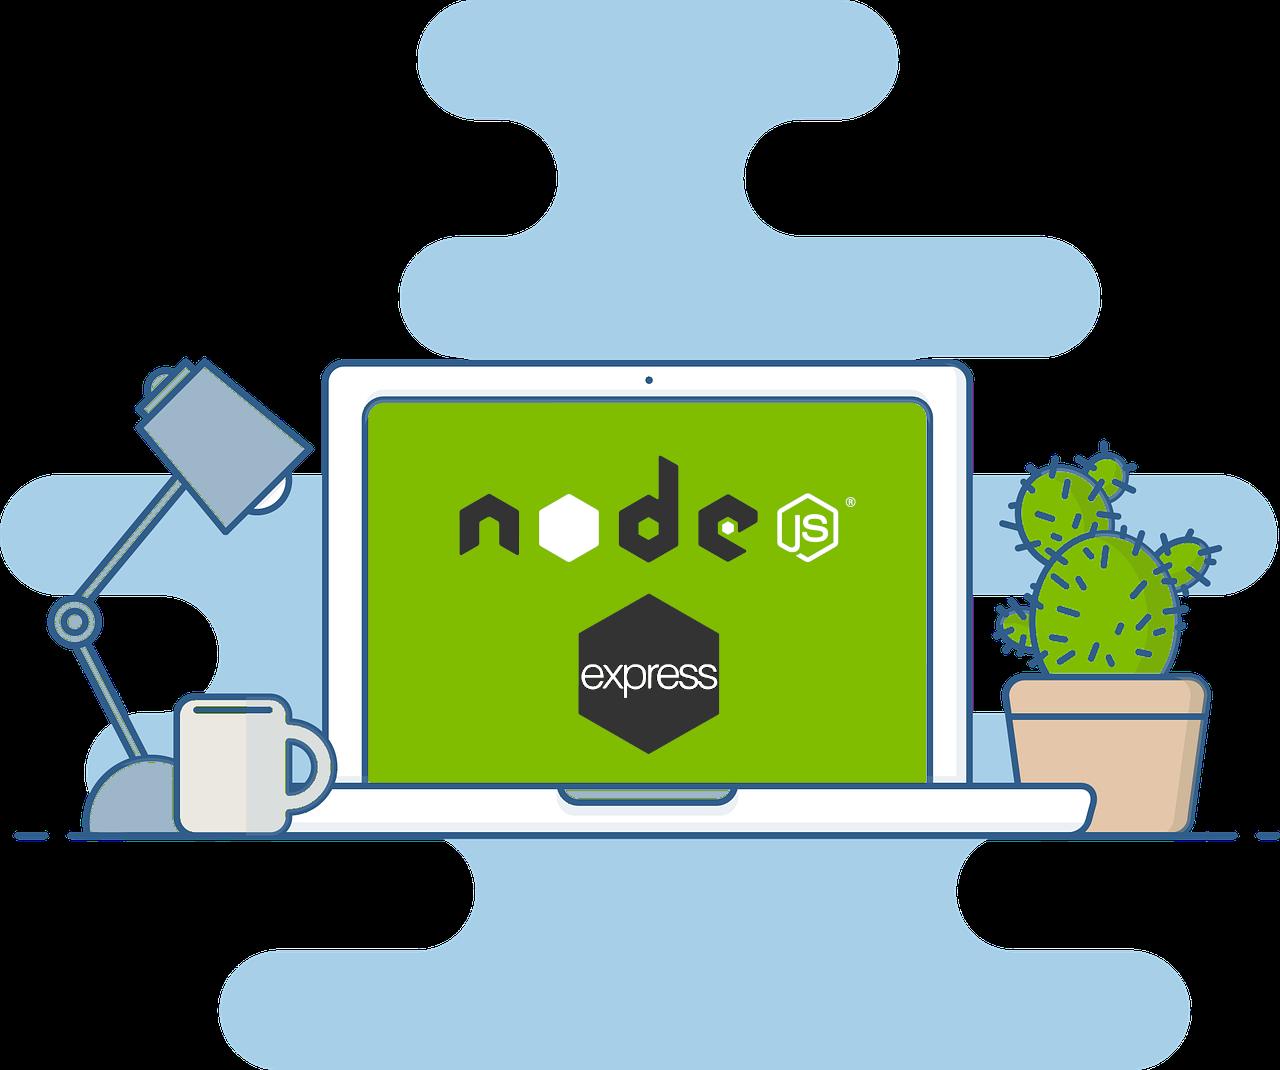 images/nodejs-express-tutorial-2021.png